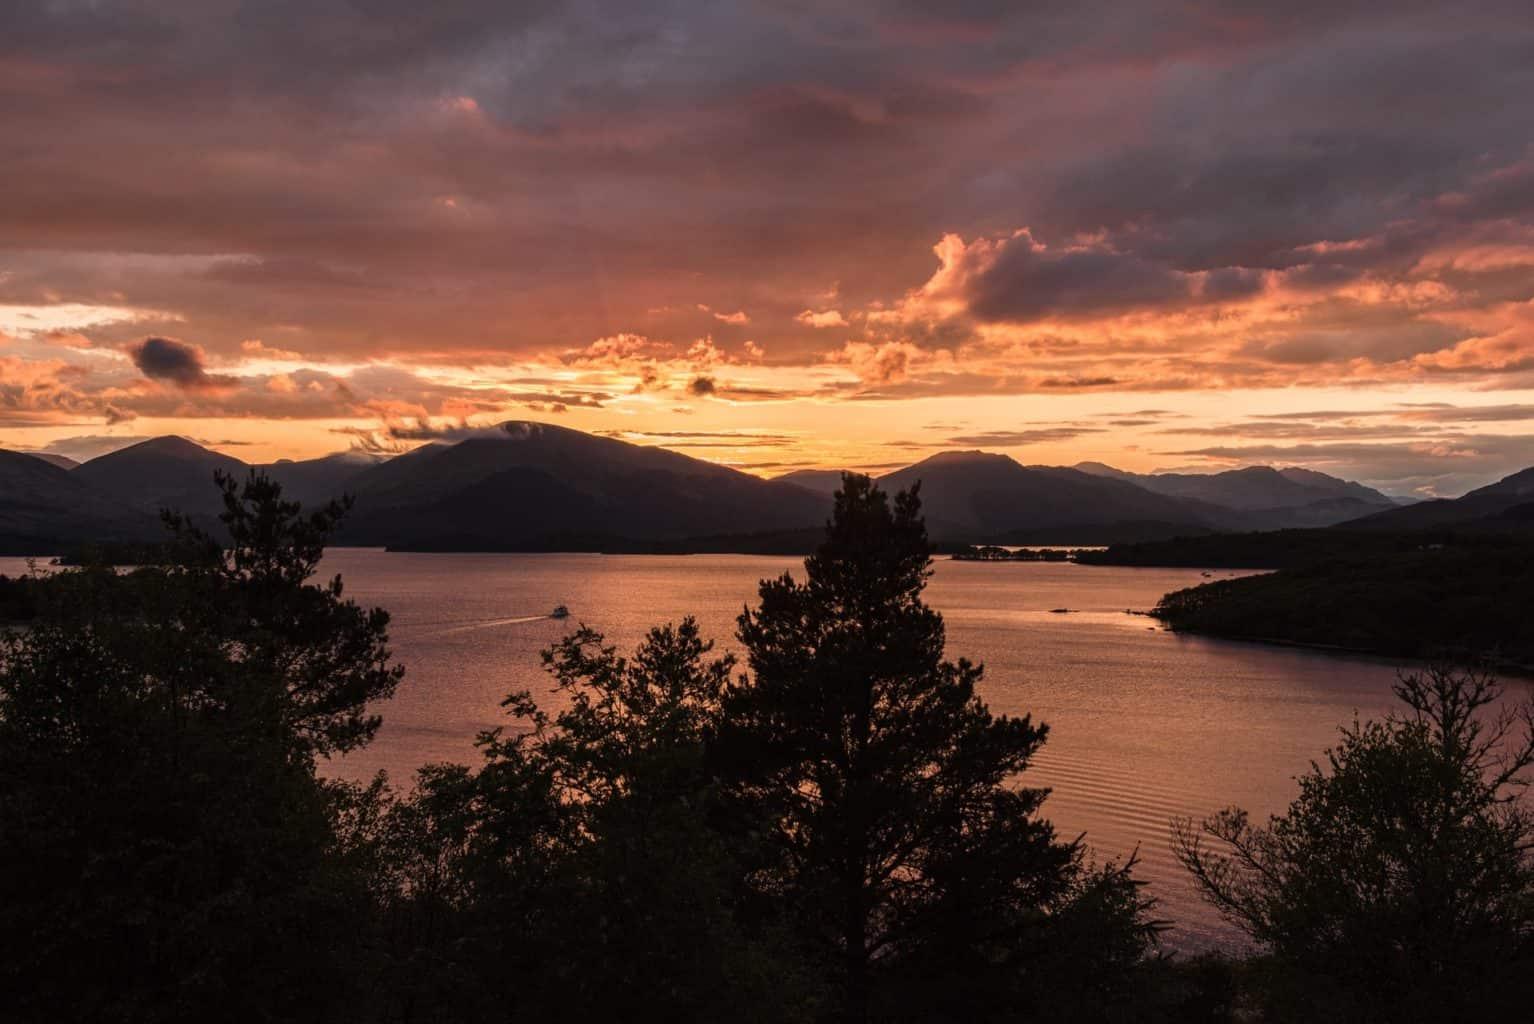 Sunset over Loch Lomond in Balmaha